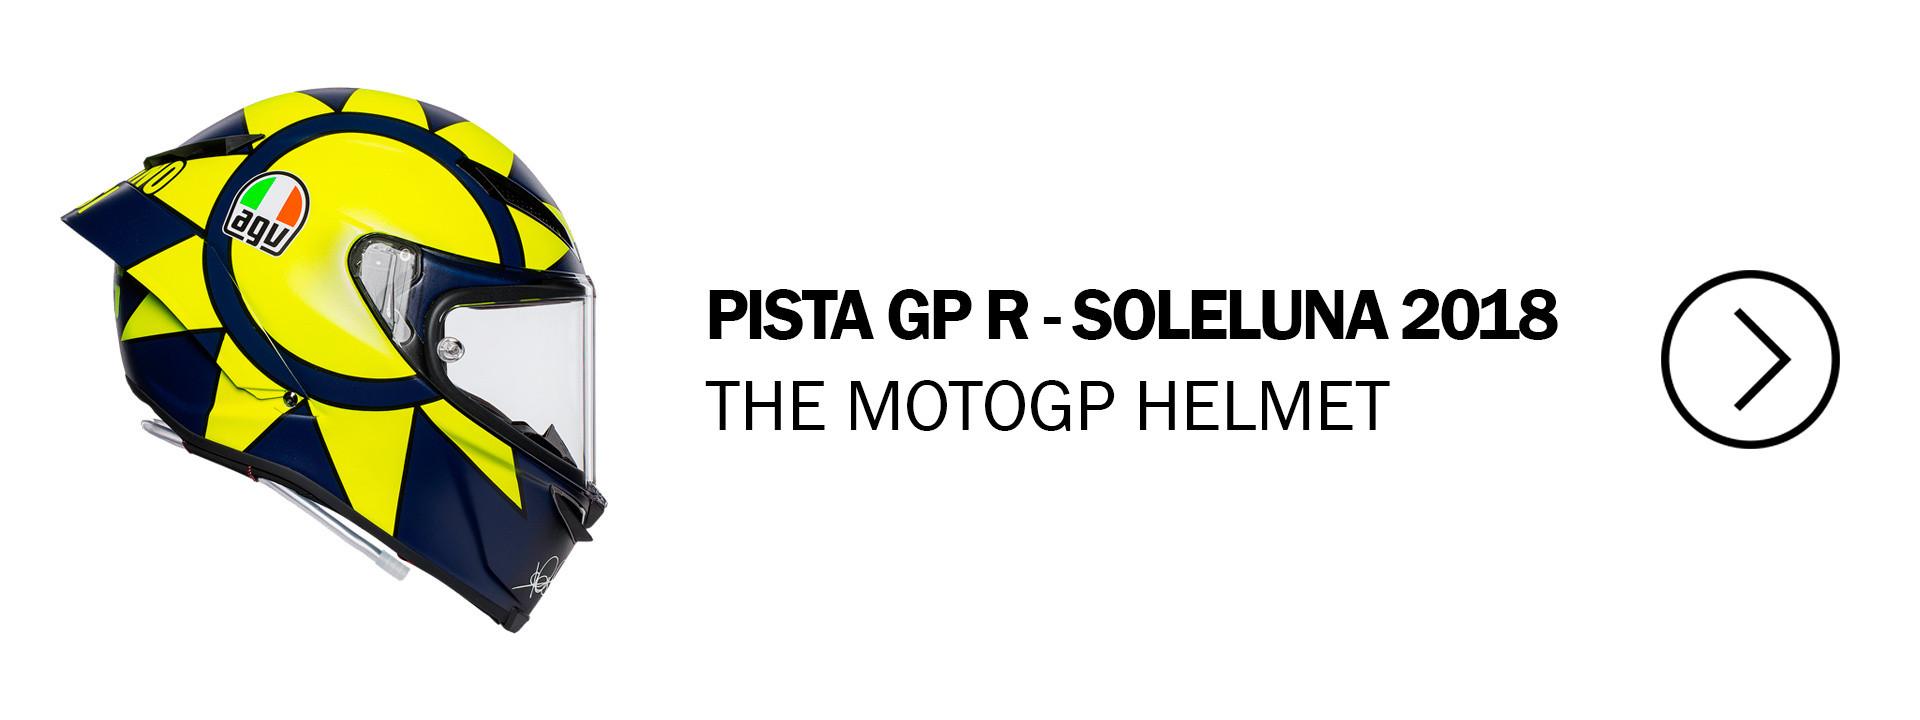 PISTA GP R